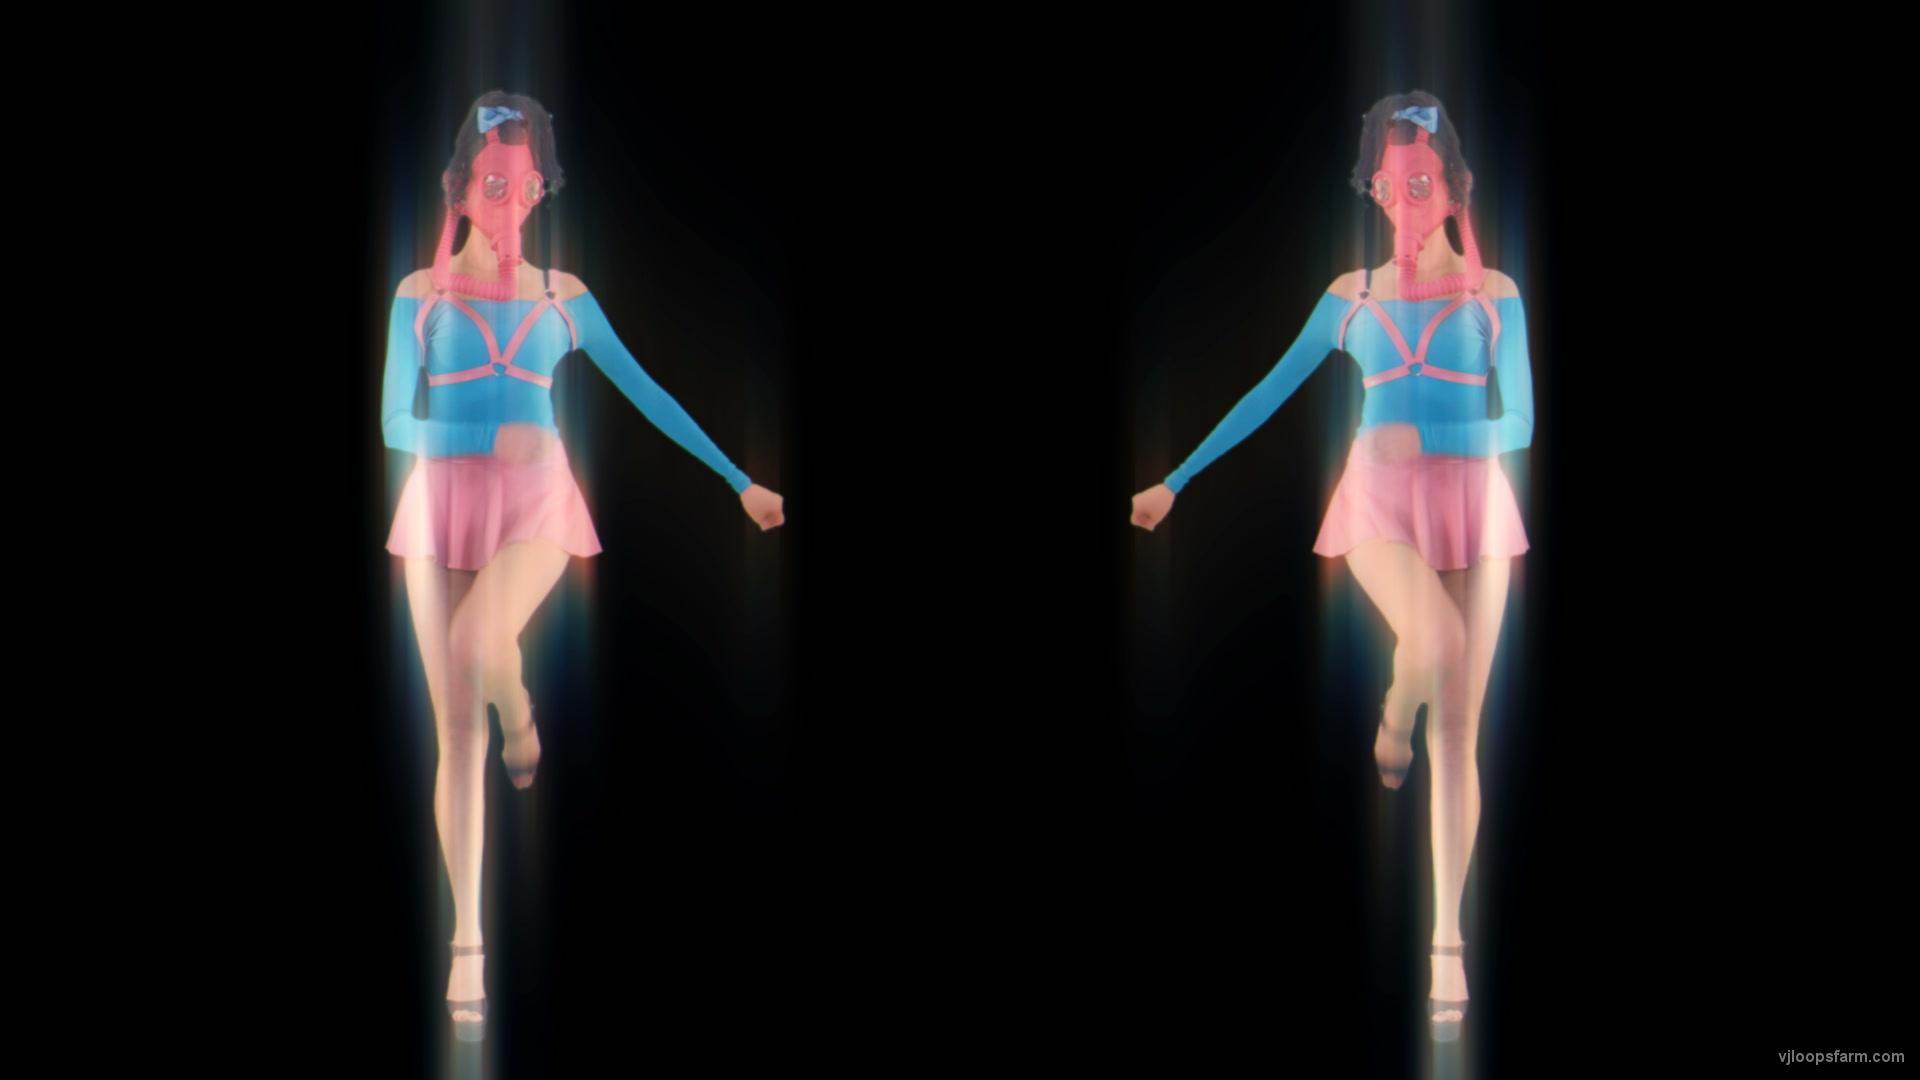 vj video background Side-Decor-Chornobyl-Glamour-Girls-marshing-with-glowing-effect-Video-art-vj-loop_003